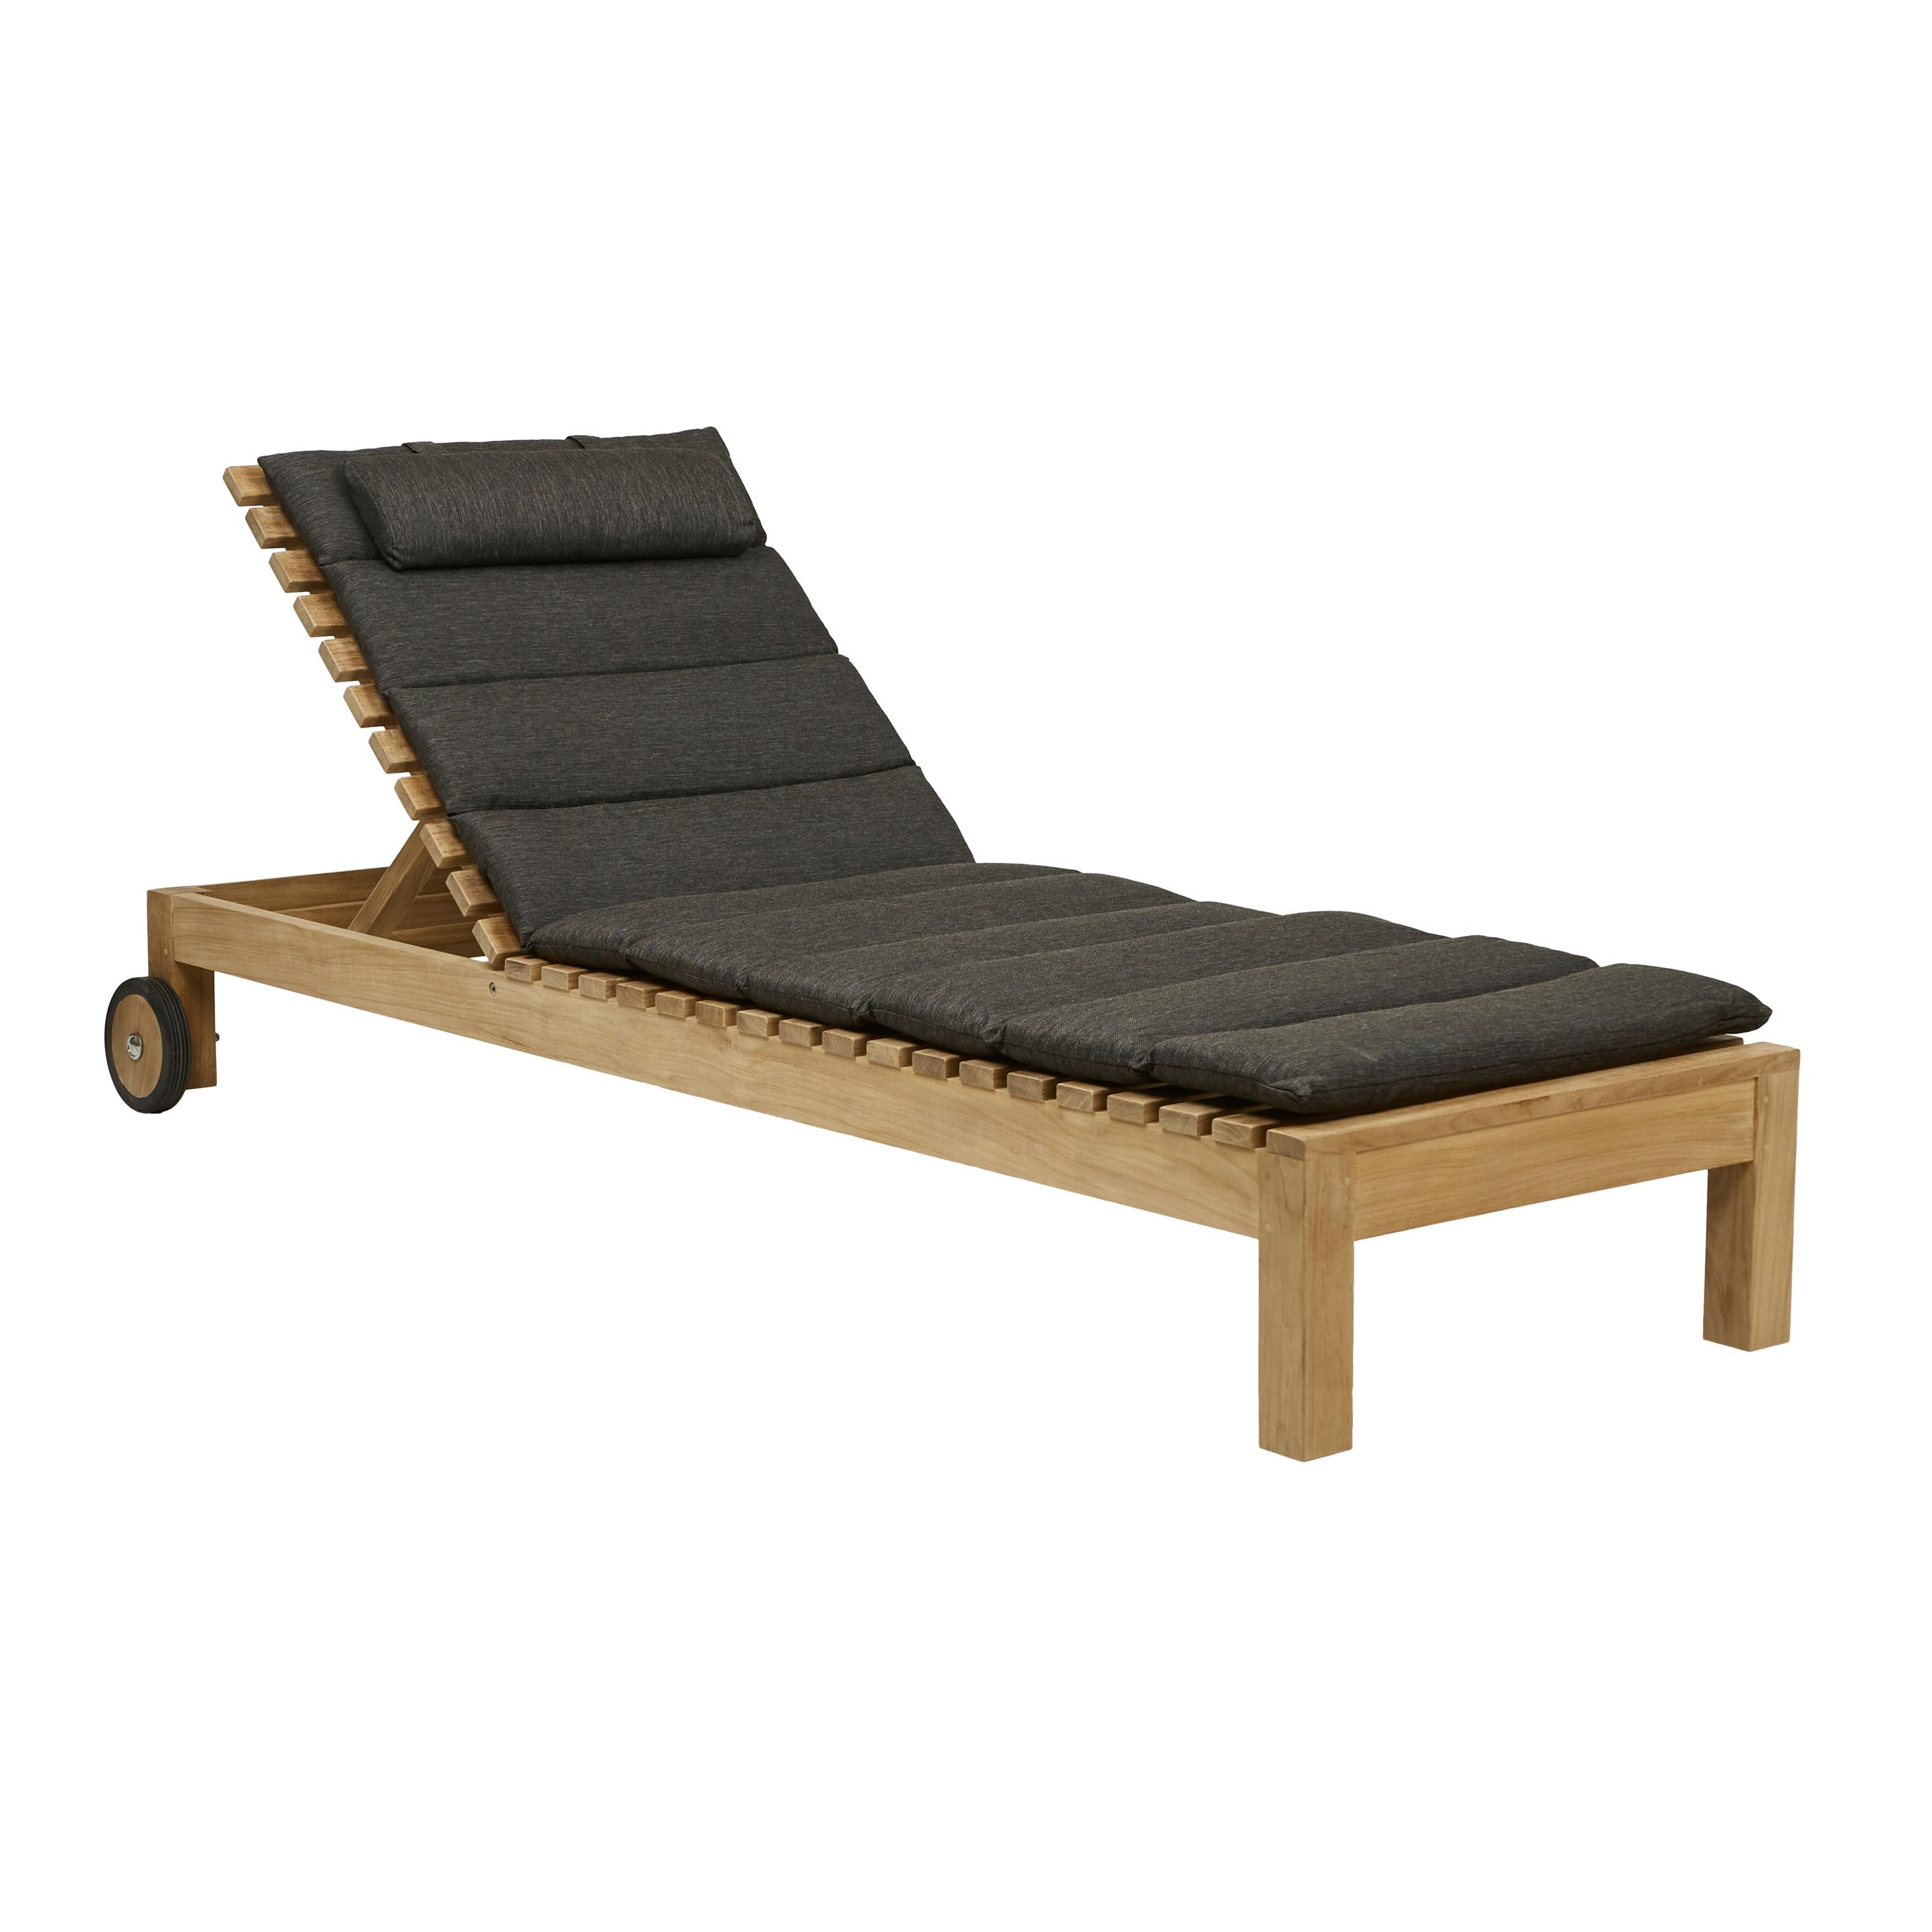 Furniture Hero-Images Sunbeds-and-Daybeds sonoma-tufted-sunbed-03